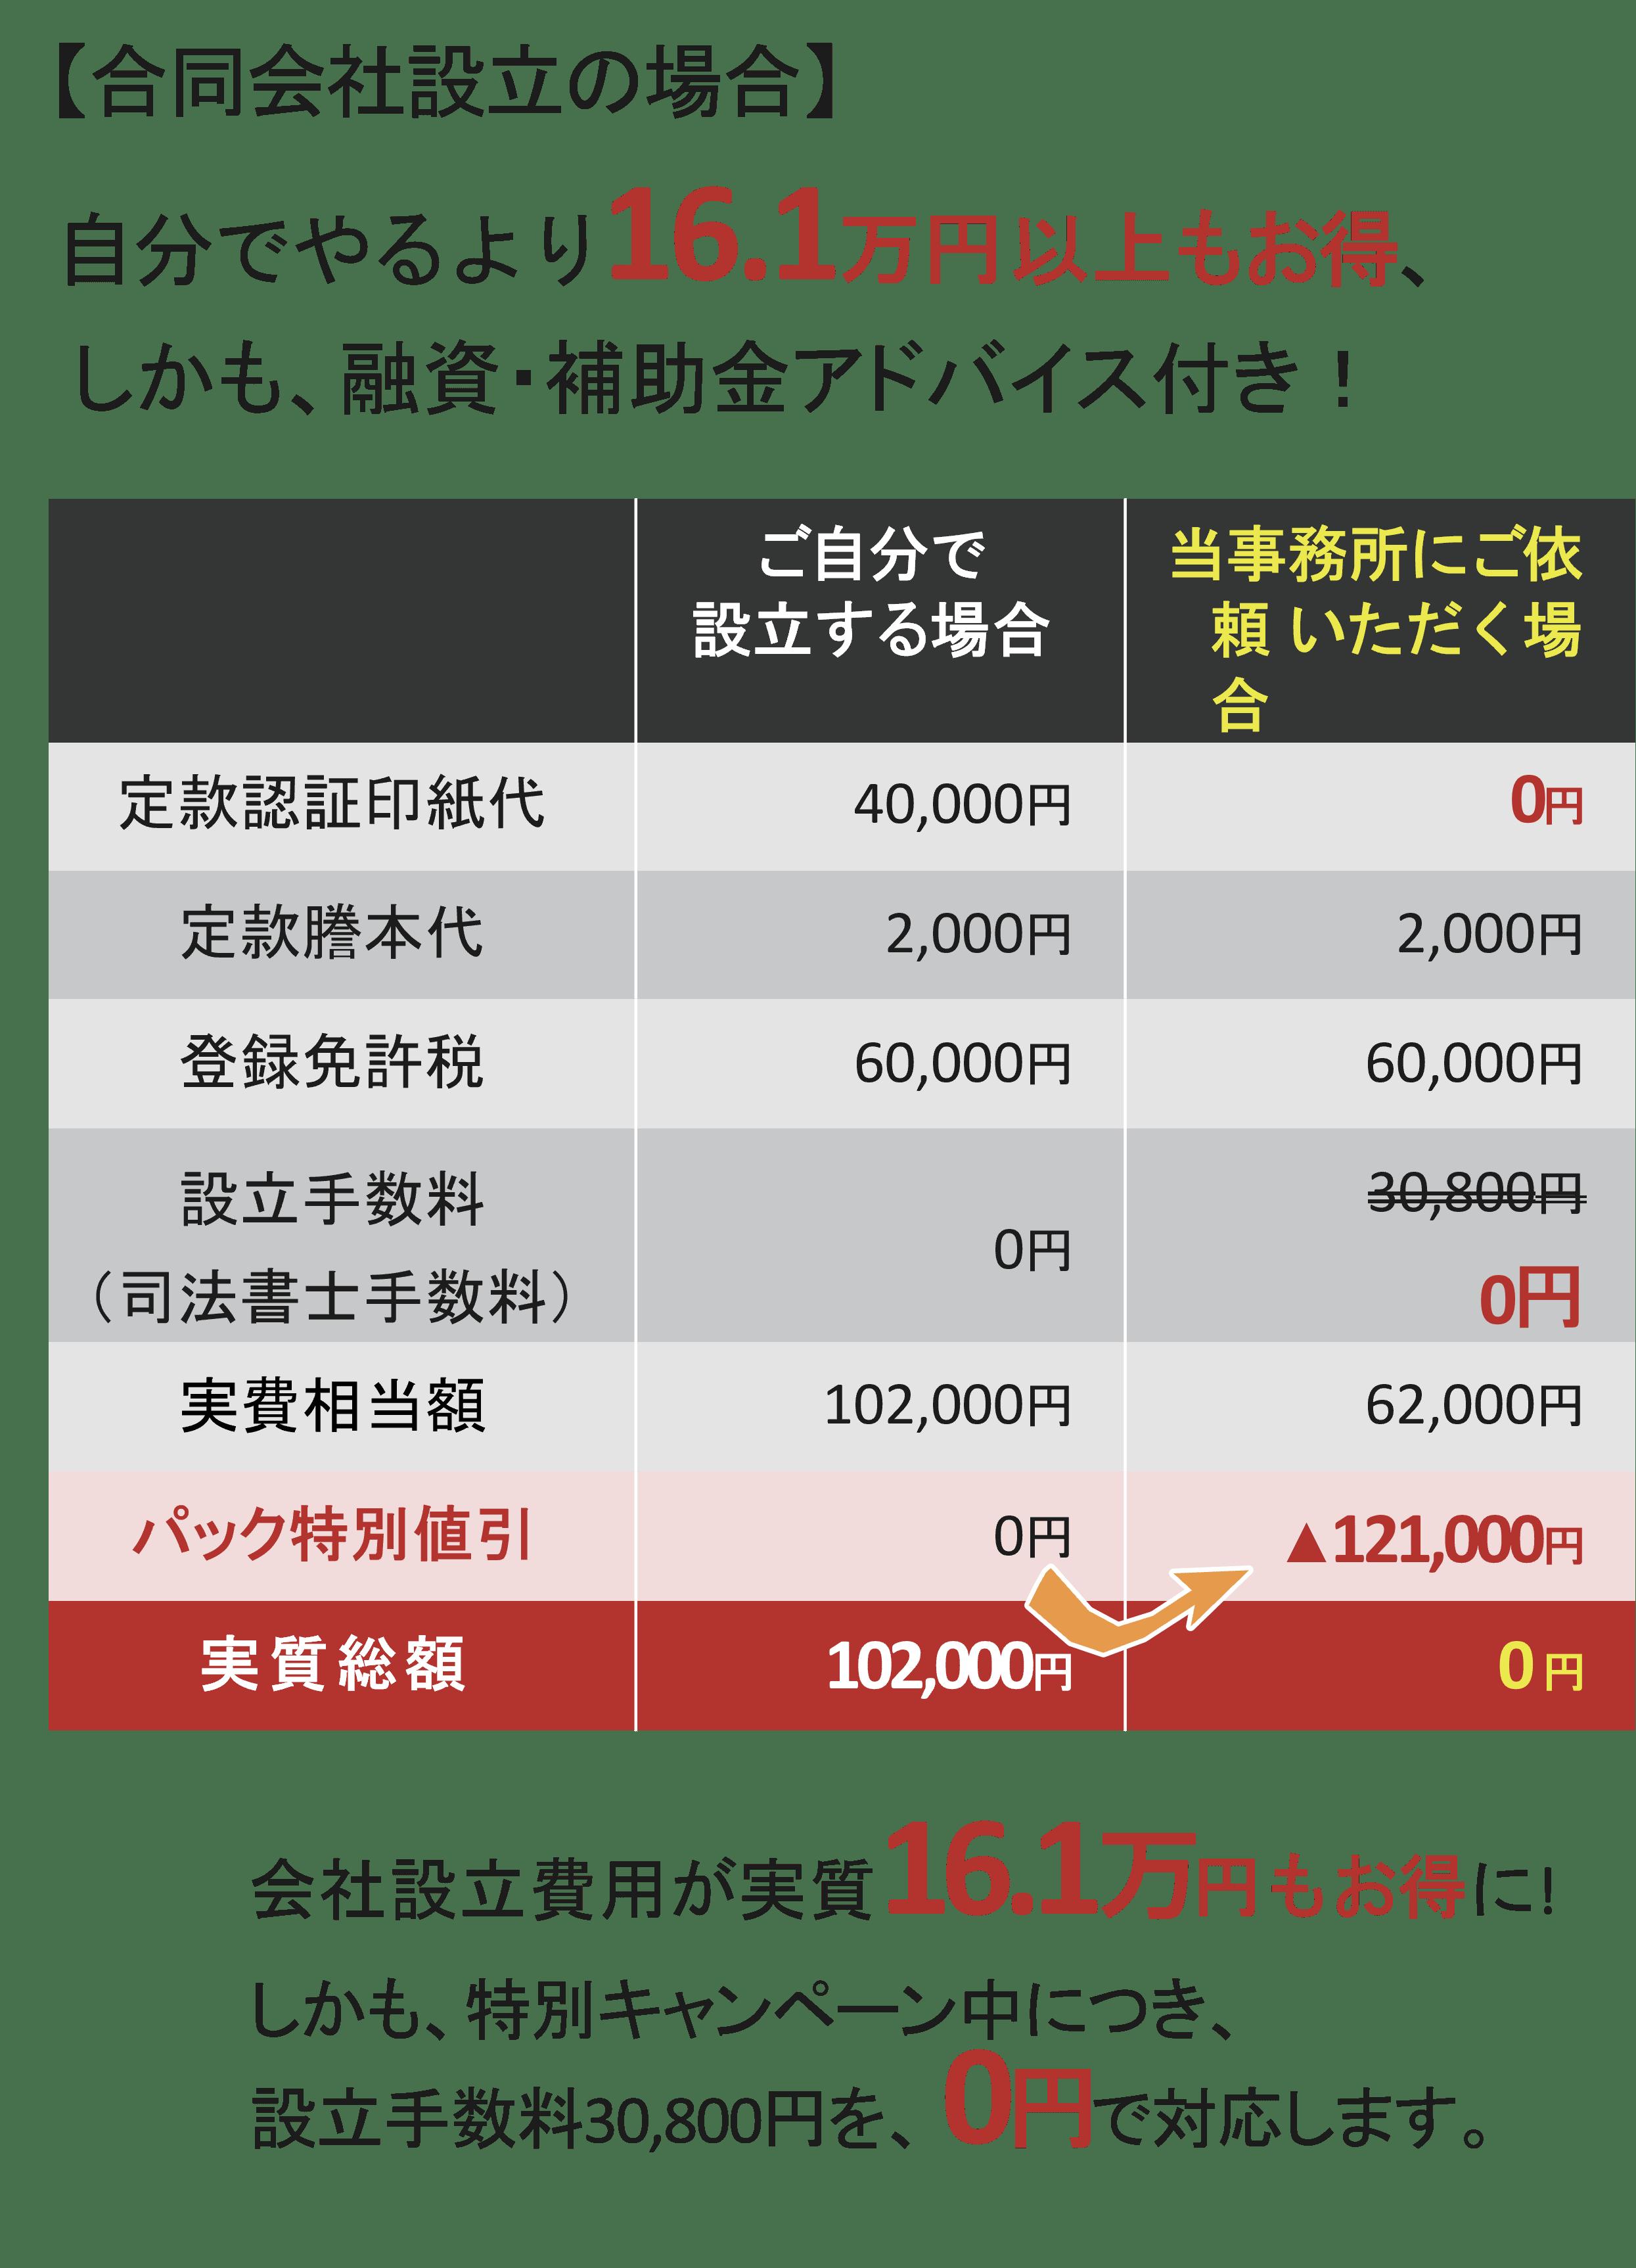 合同会社費用の比較